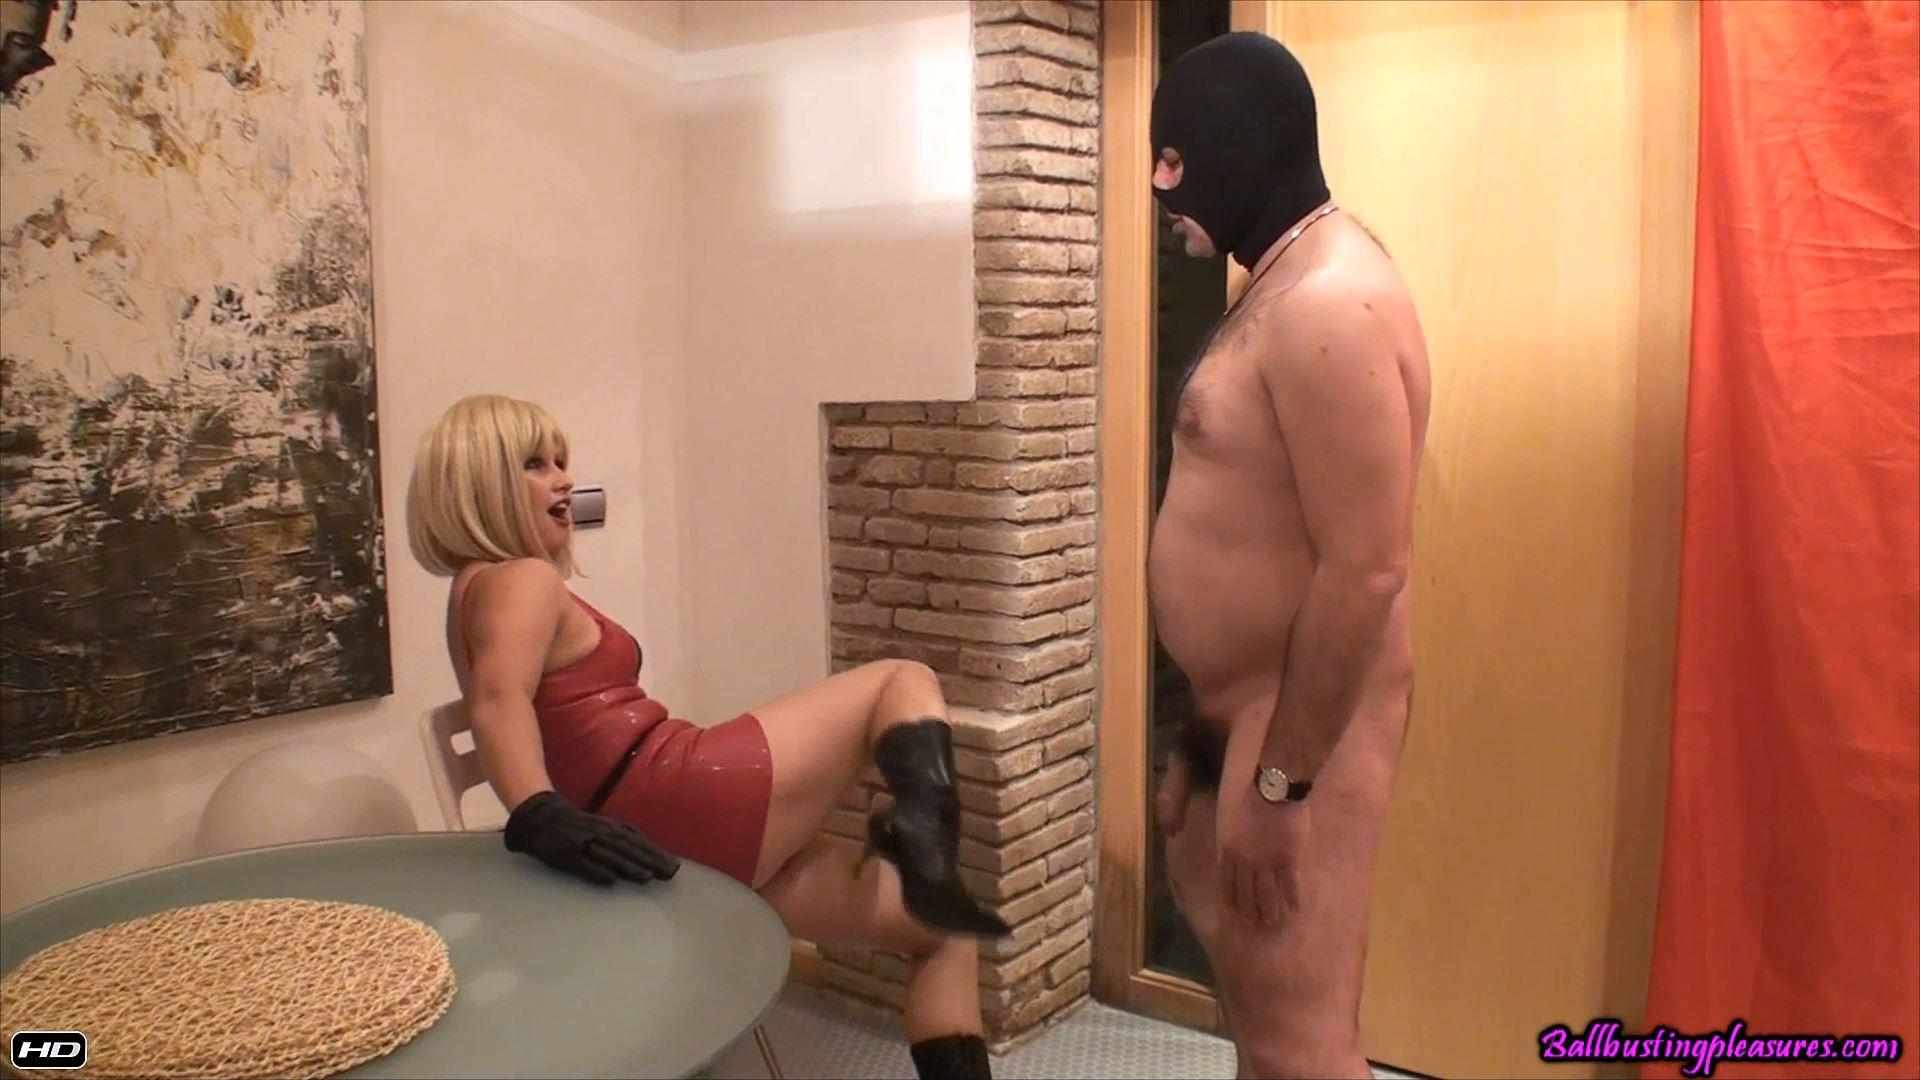 Goddess Karen In Scene: Demolished Nuts - BALLBUSTINGPLEASURES - FULL HD/1080p/MP4